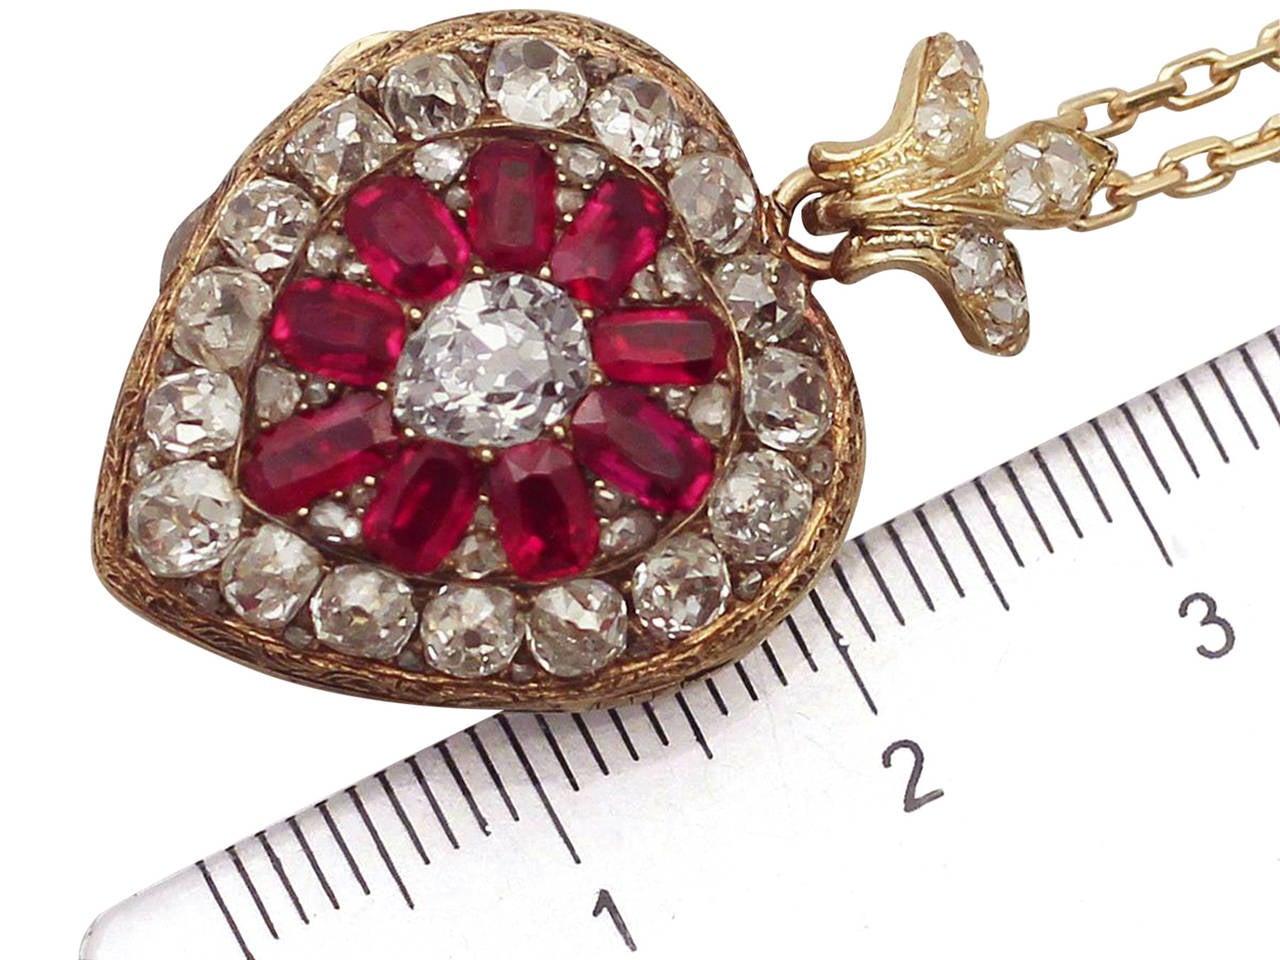 1880s Synthetic Ruby 4.55 Carats Diamonds Gold Pendant Locket 5